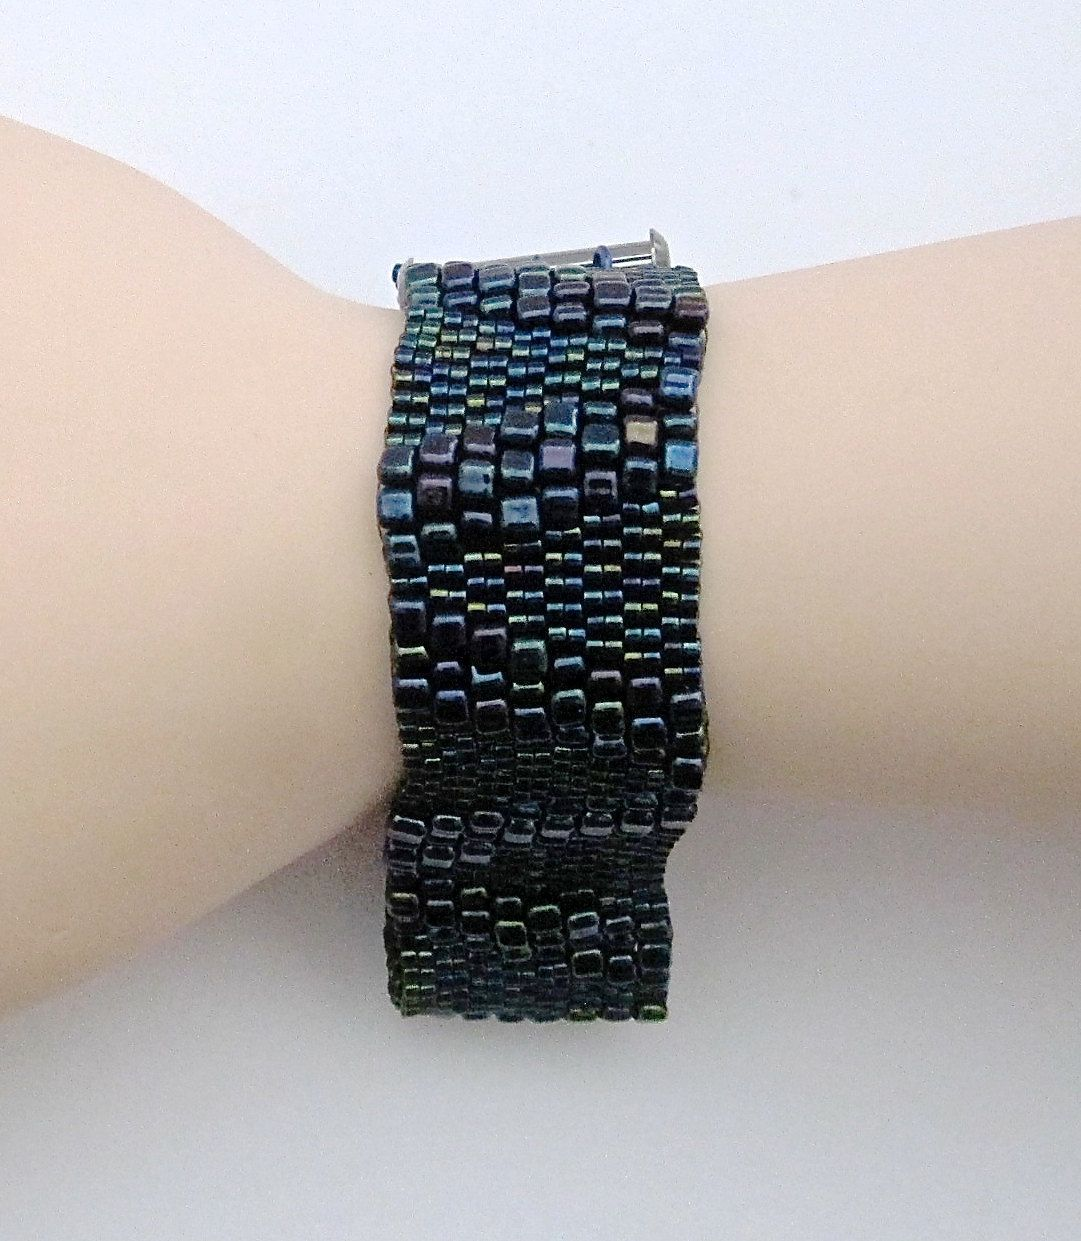 The Three of V Beaded Wrist Cuff Bracelet features Miyuki Japanese seed beads, gunmetal finished 3-strand sliding tube clasp and niobium jump